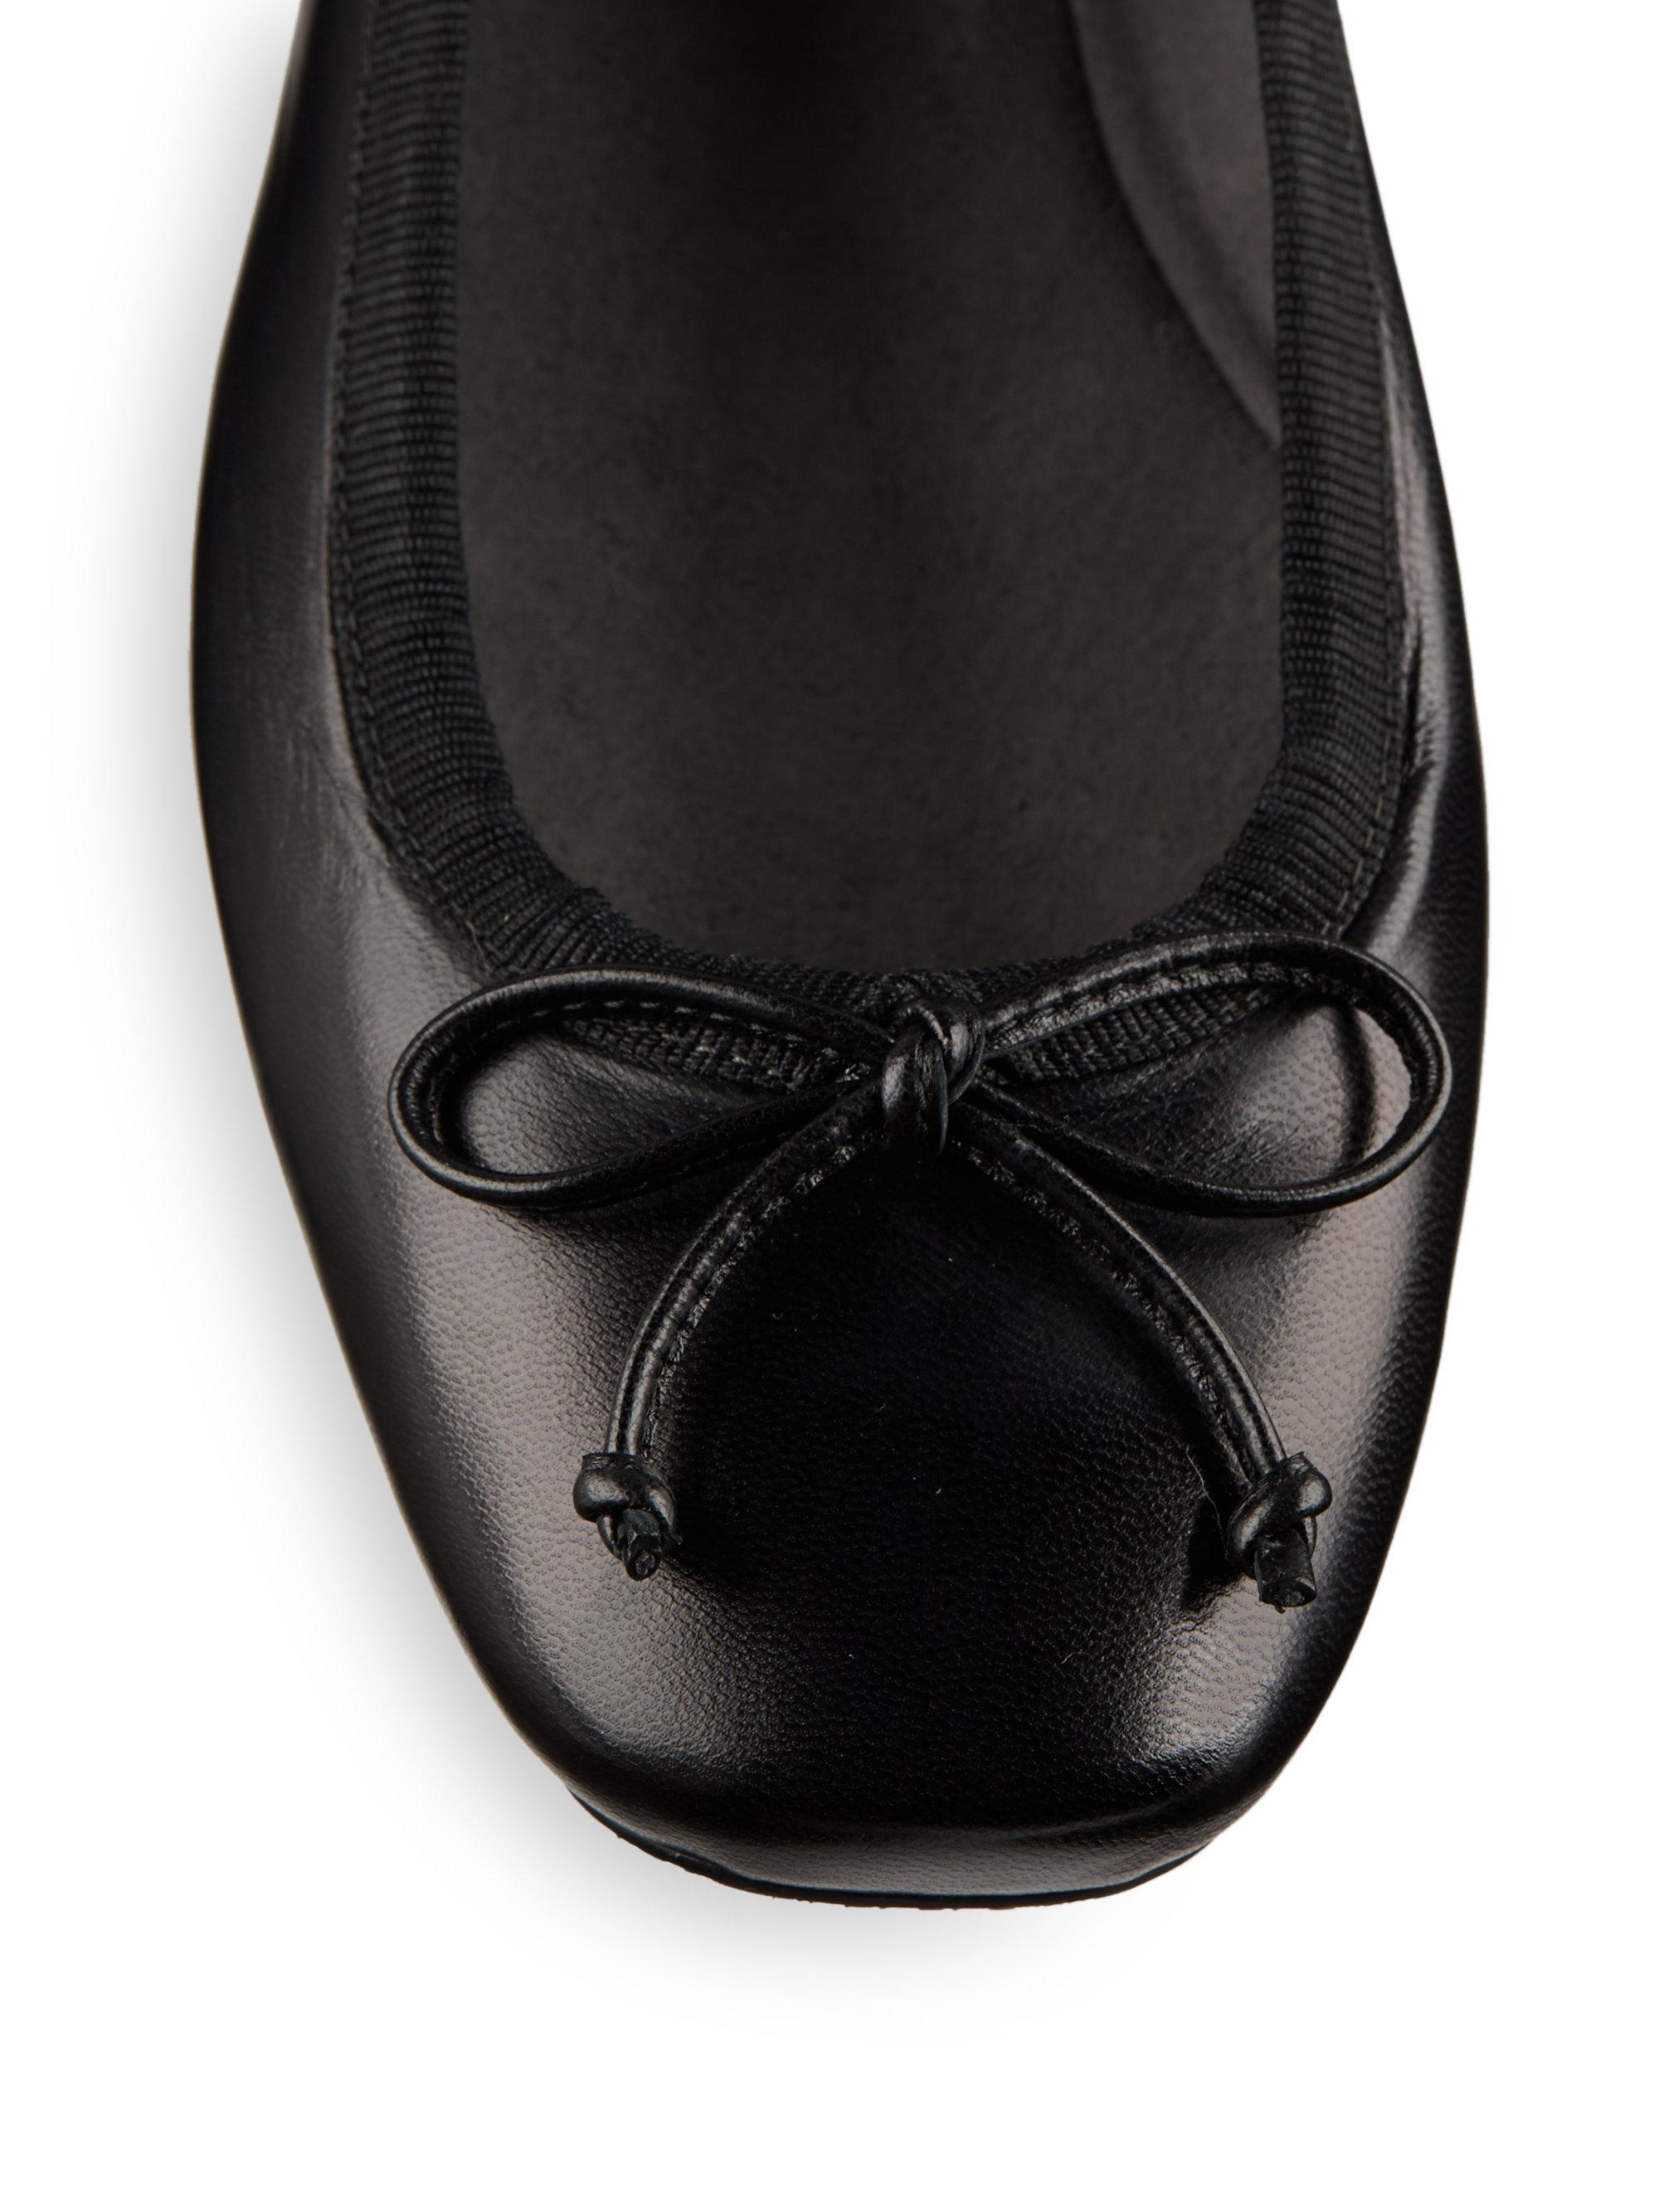 Stuart Weitzman Shoestring Leather Ballet Flats In Black